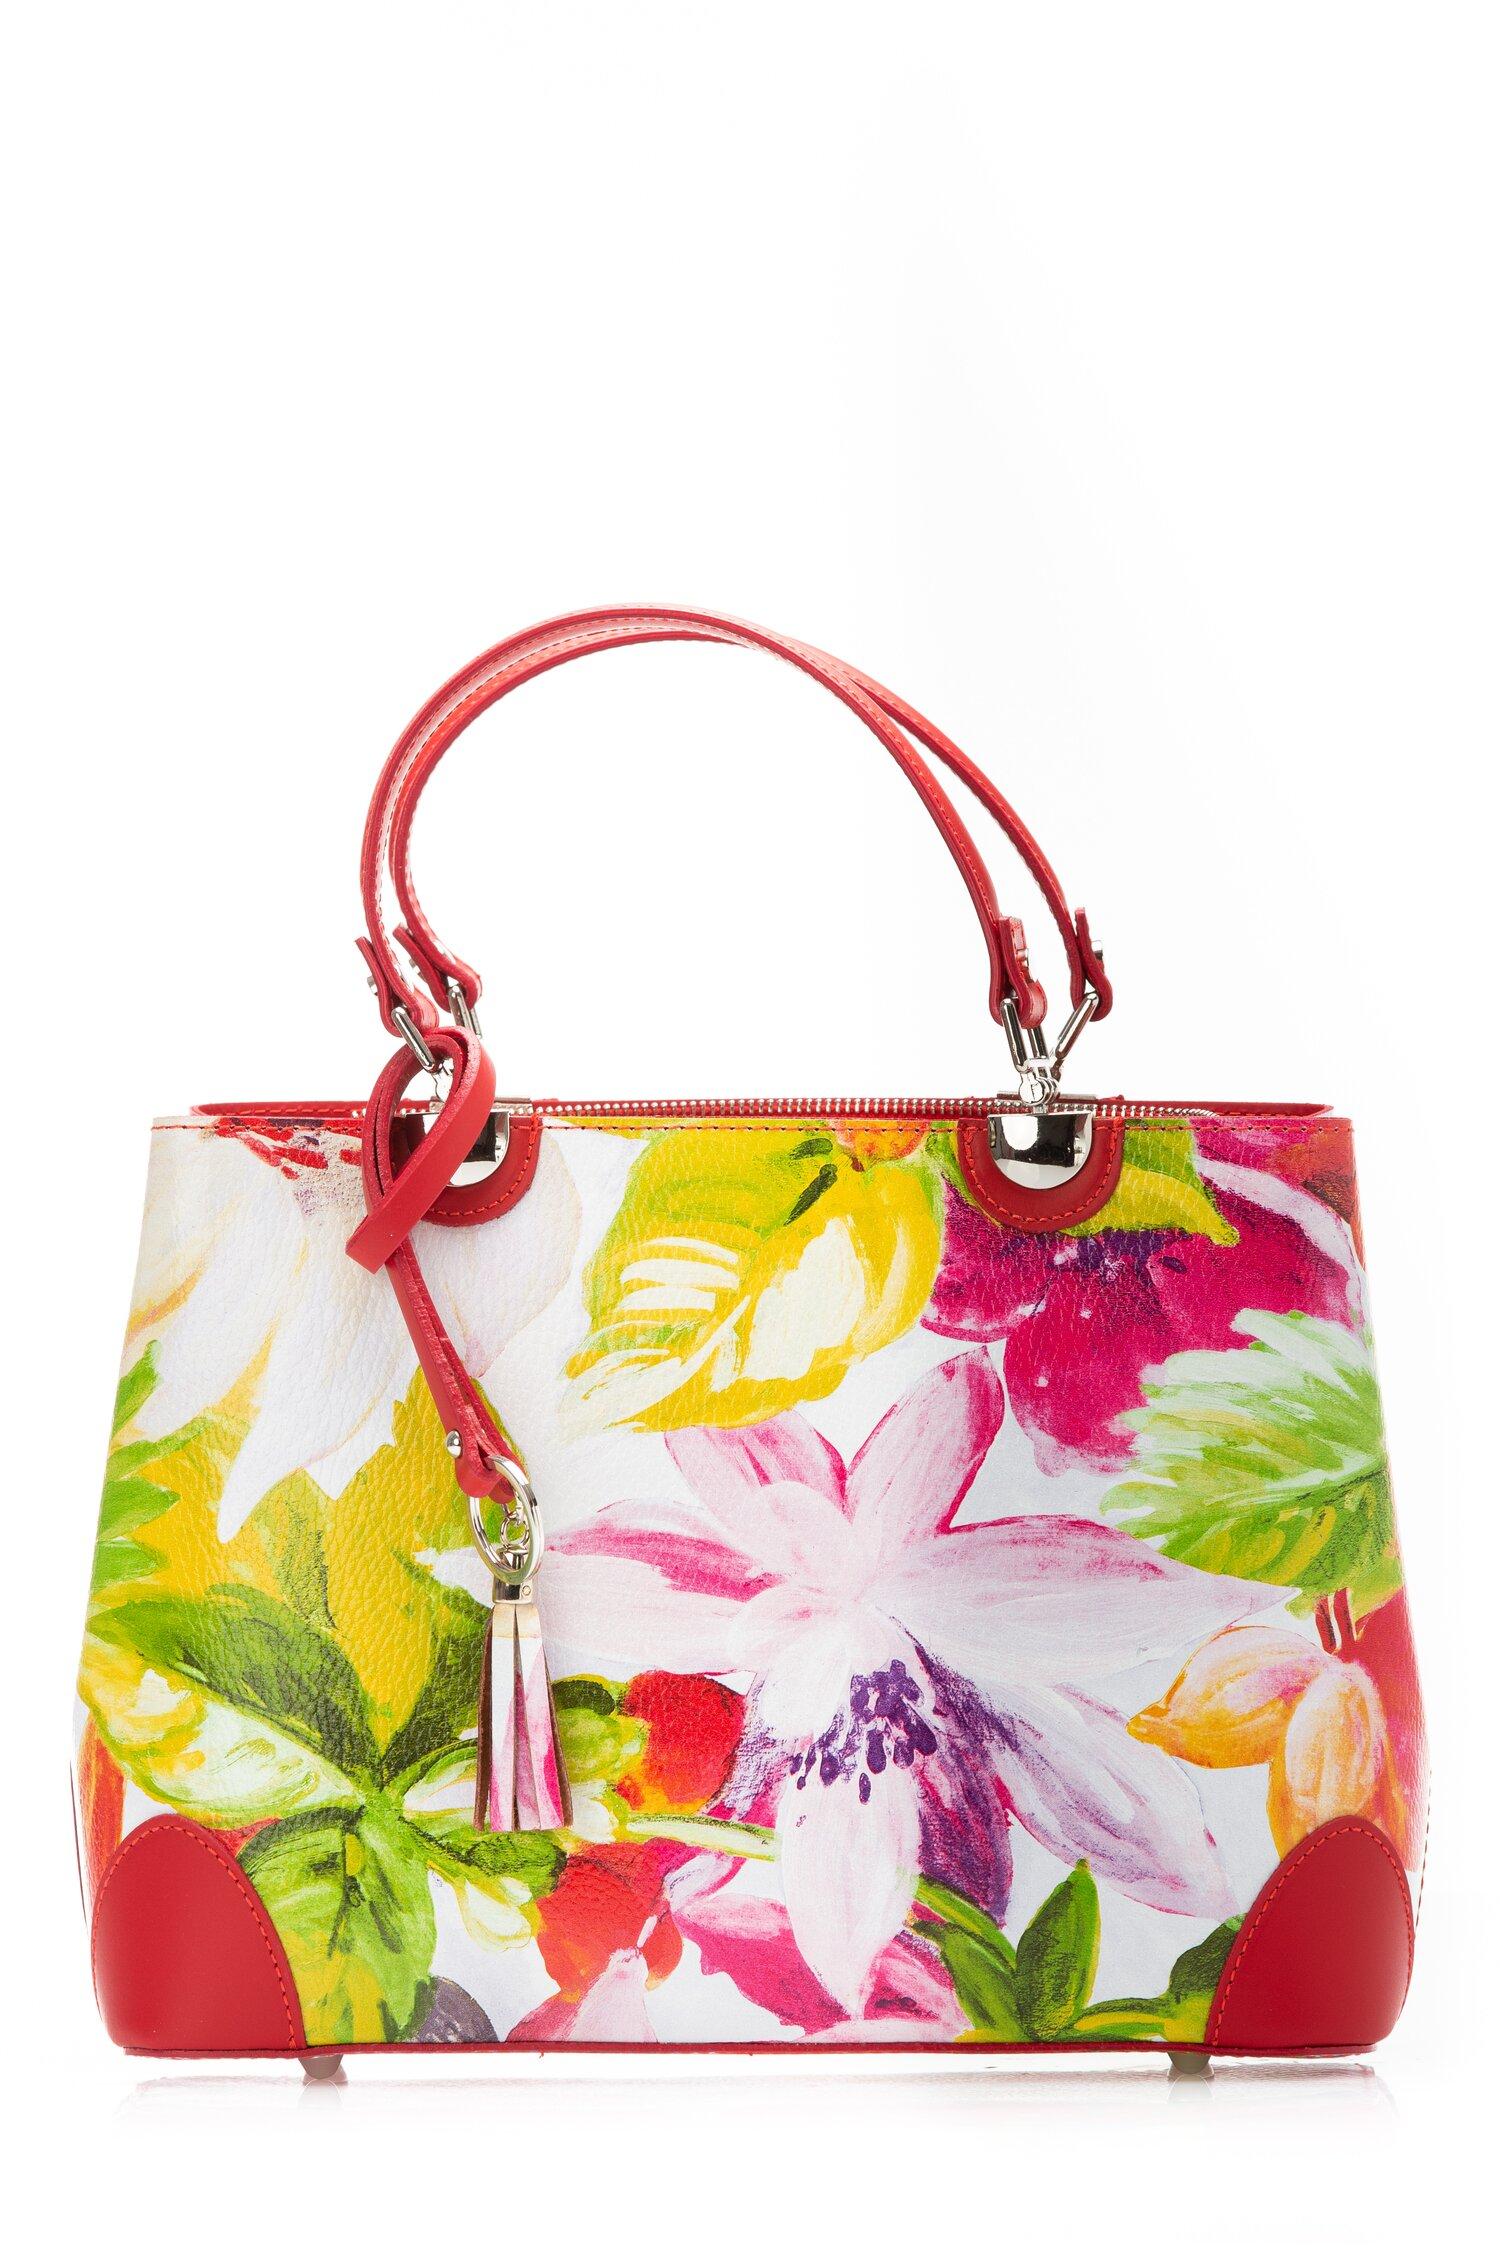 Geanta Charlize cu imprimeu floral paint imagine